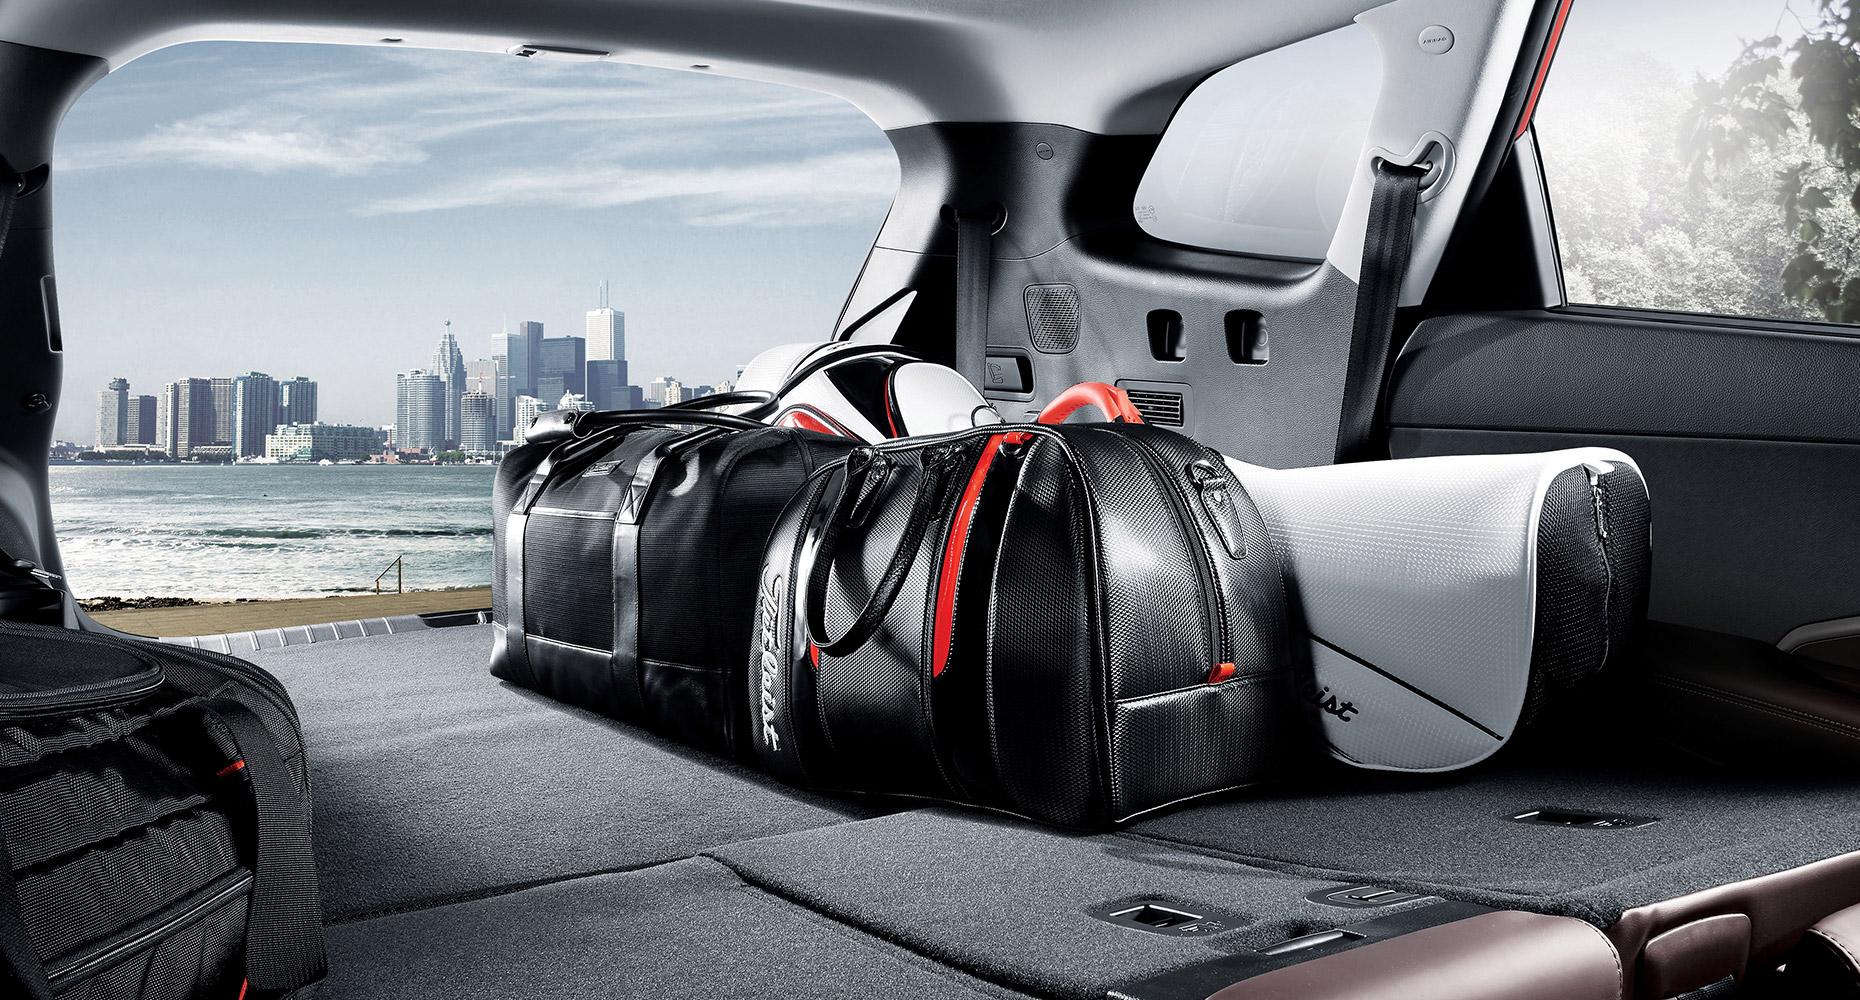 Interior Photo Of Hyundai Santa Fe Xl 2018 Suv Reclining